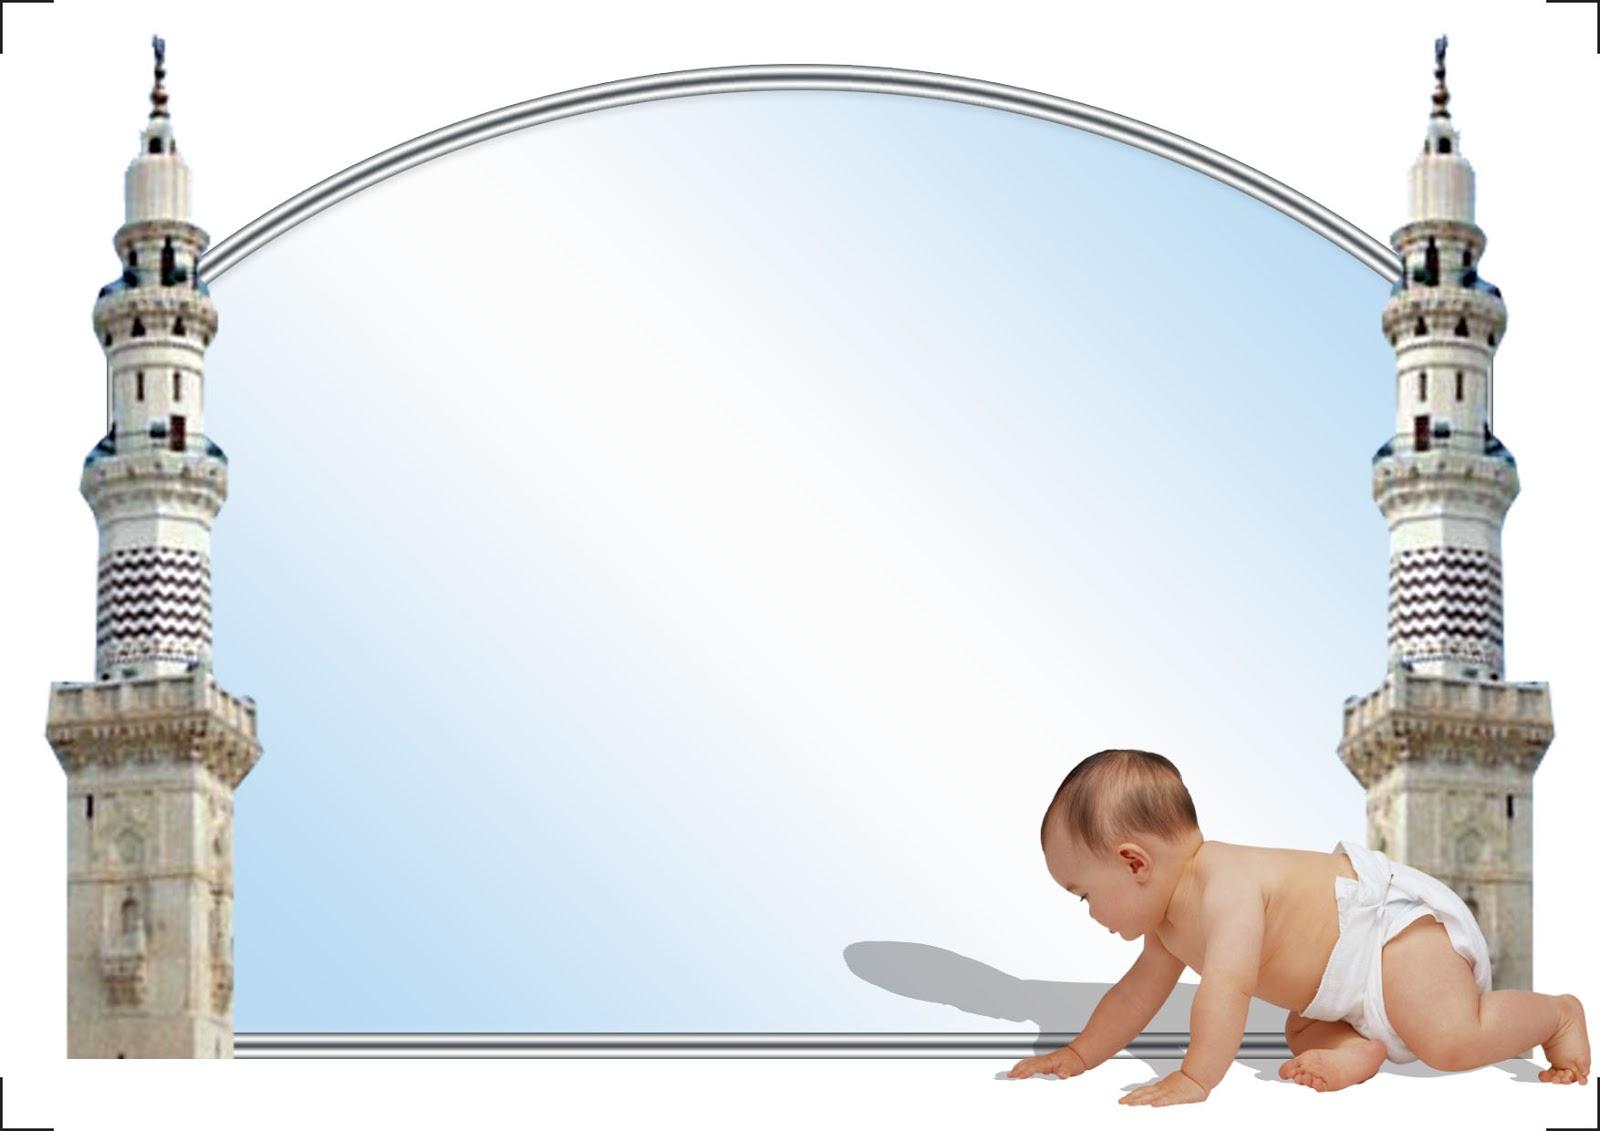 Unduh 900 Background Anak Bayi Laki-Laki Paling Keren ...